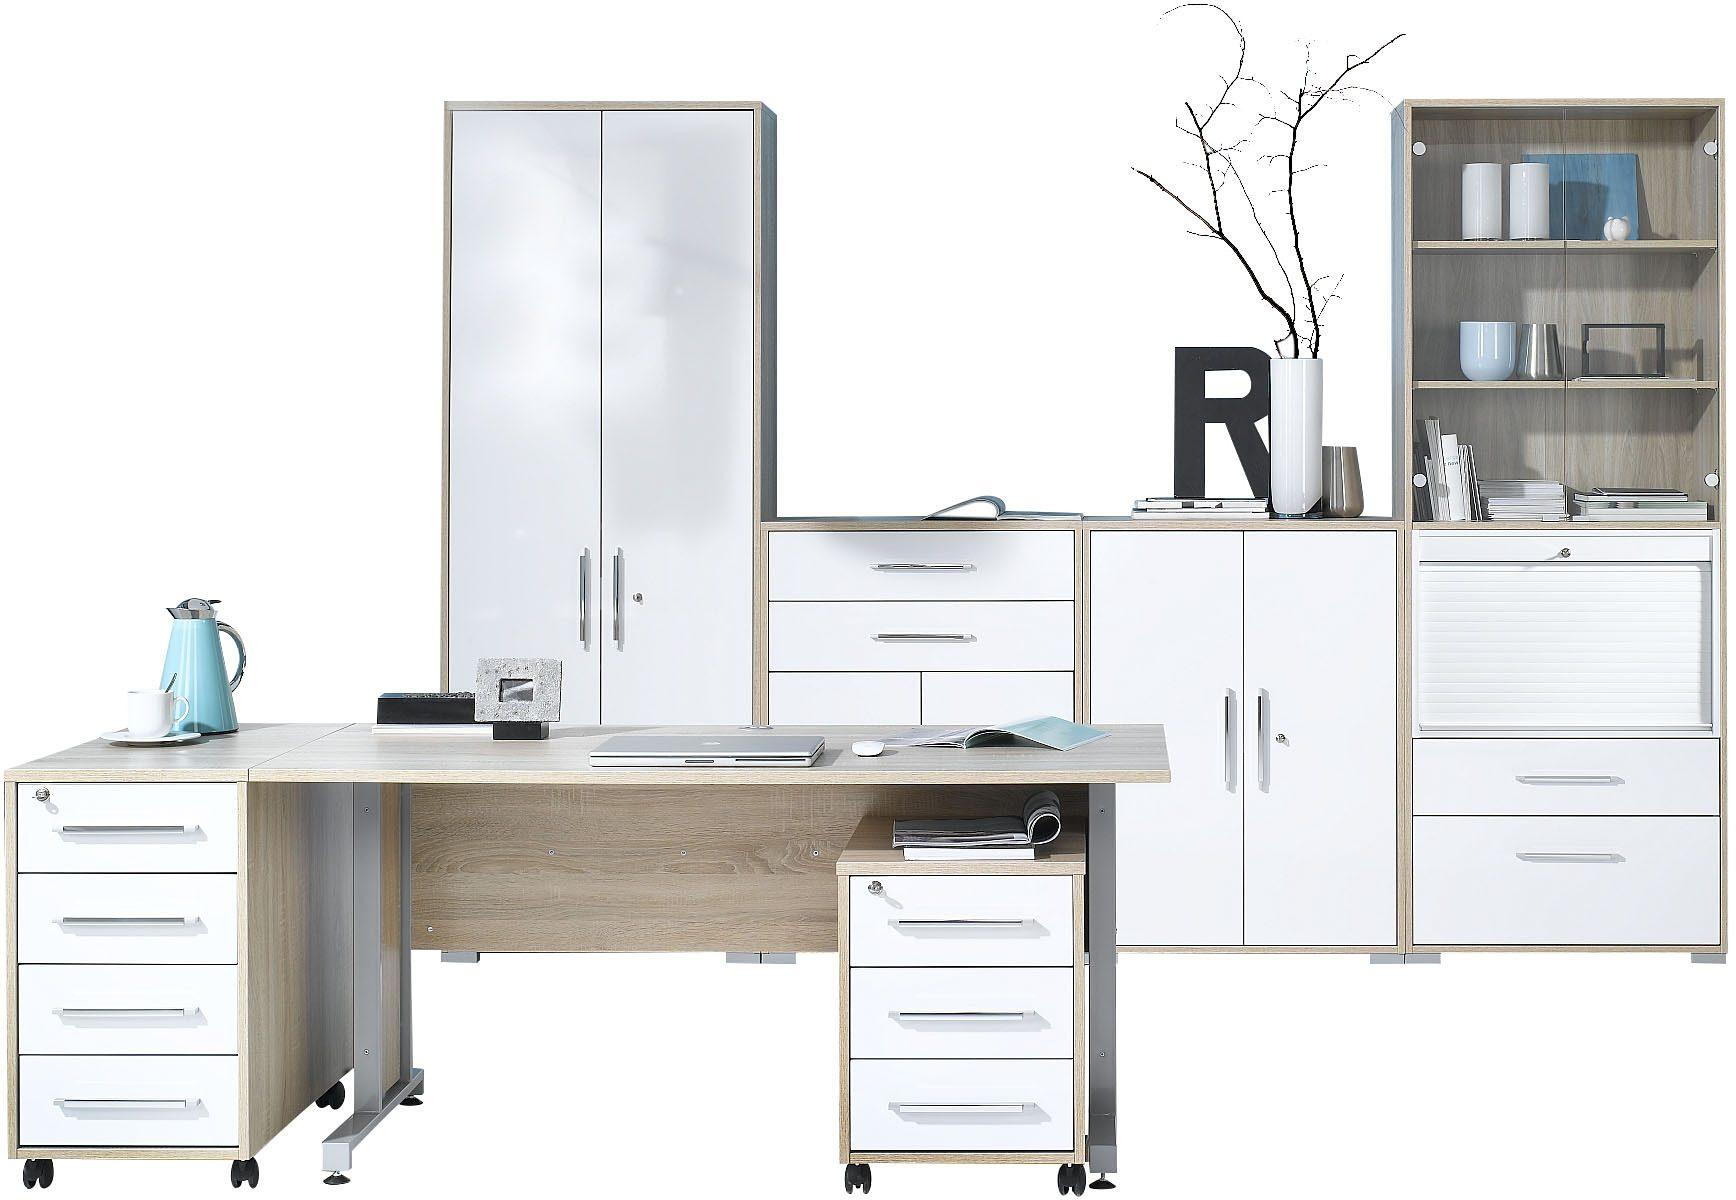 Maja Möbel Büromöbel-Set (6-tlg.) »1202« | Büro > Büromöbel-Serien | Hochglanz - Glänzend - Kunststoff - Abs | MAJA MÖBEL